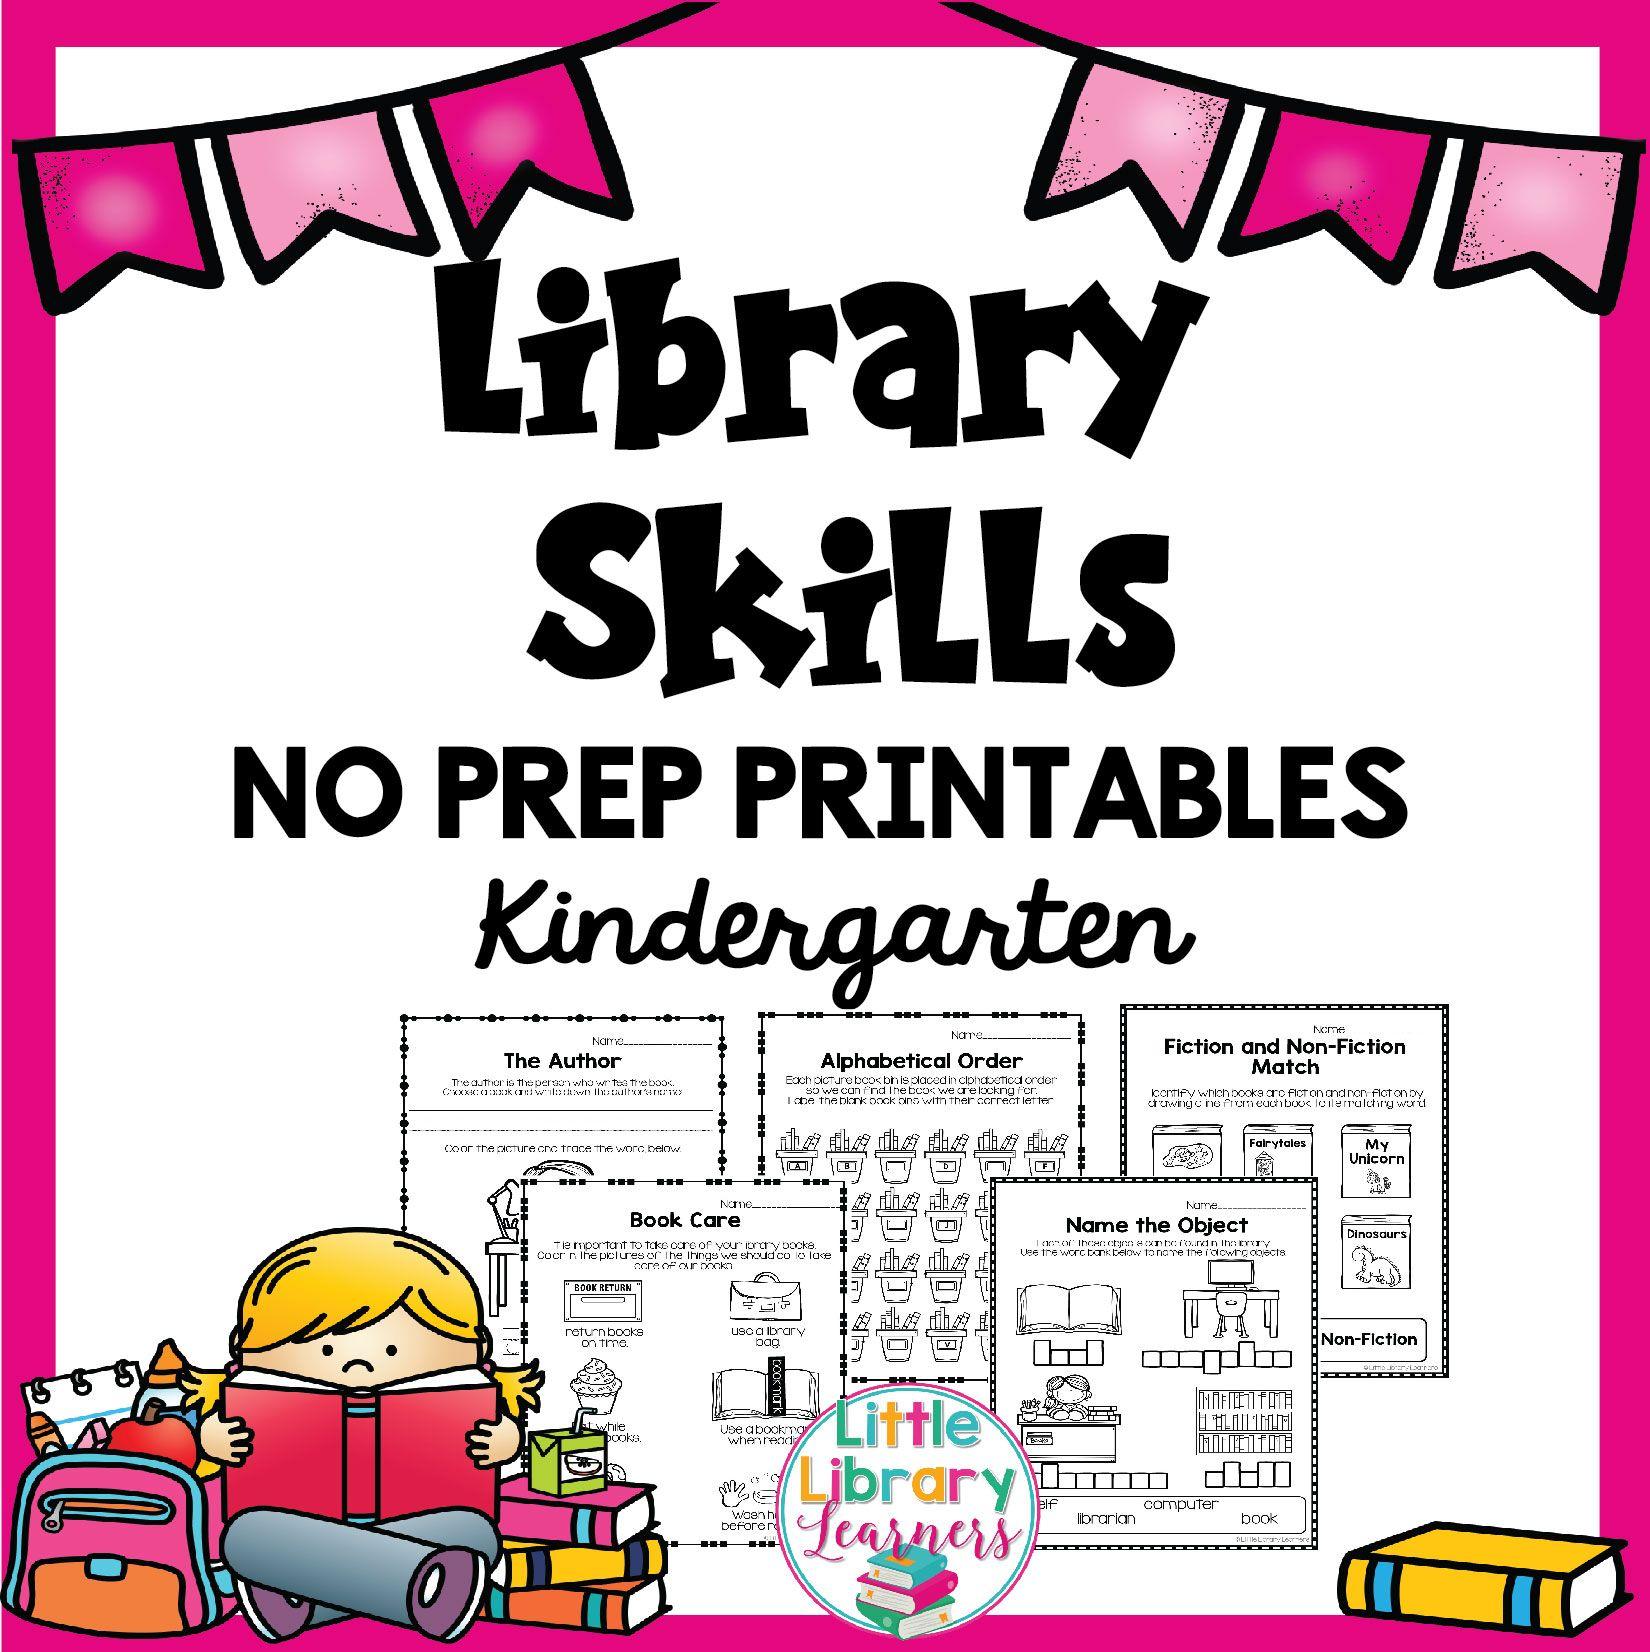 Library No Prep Printables Kindergarten Library Skills Kindergarten Printables Library Lesson Plans [ 1652 x 1650 Pixel ]